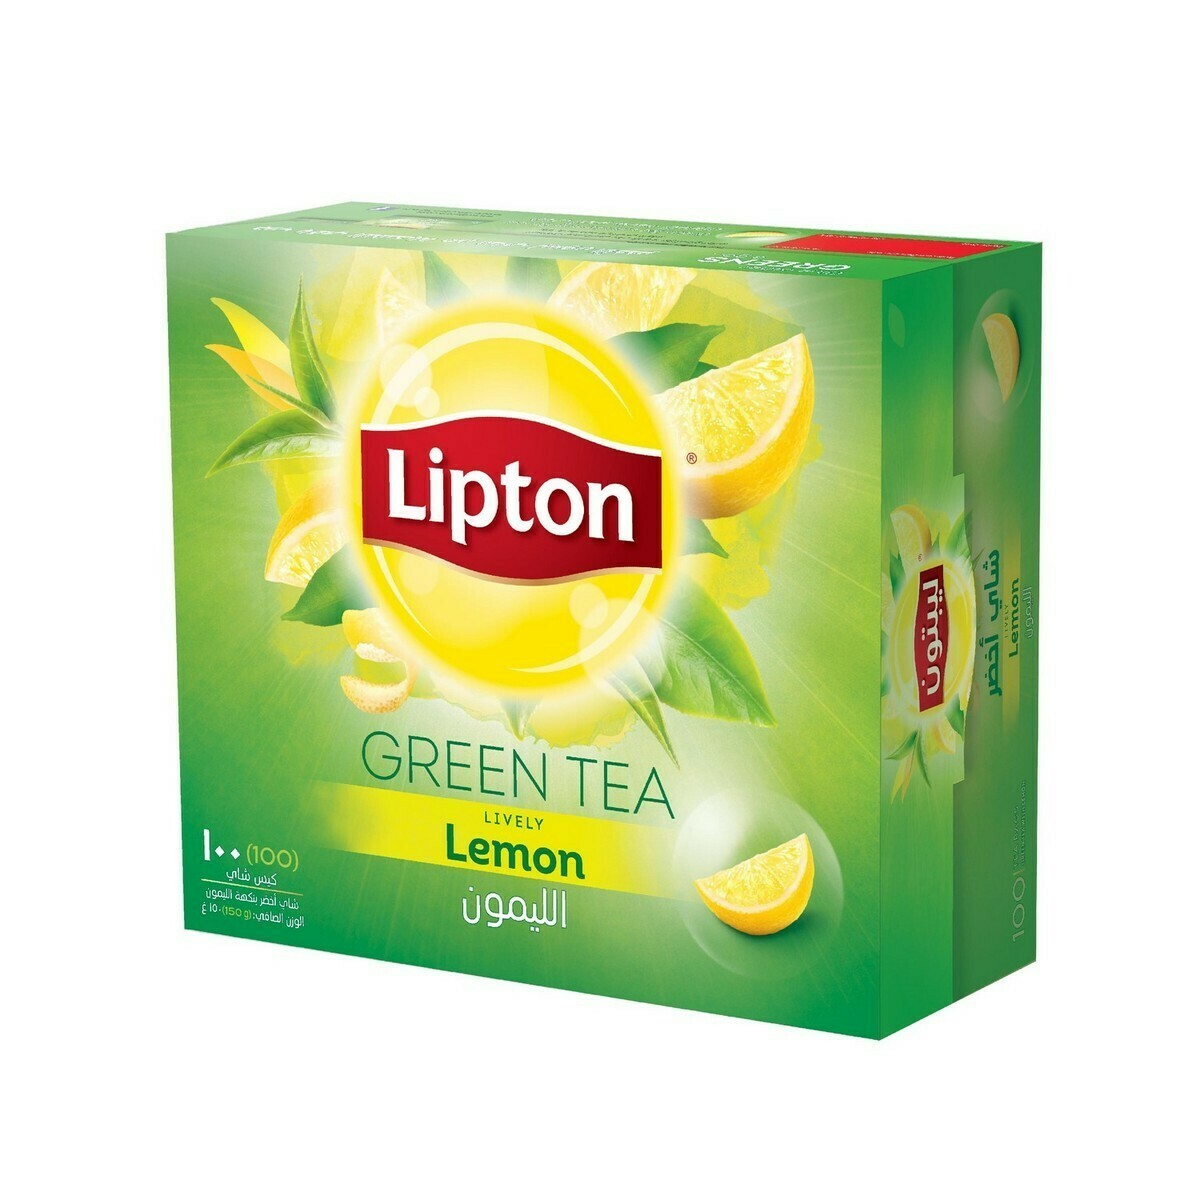 Lipton Green Tea Lively Lemon